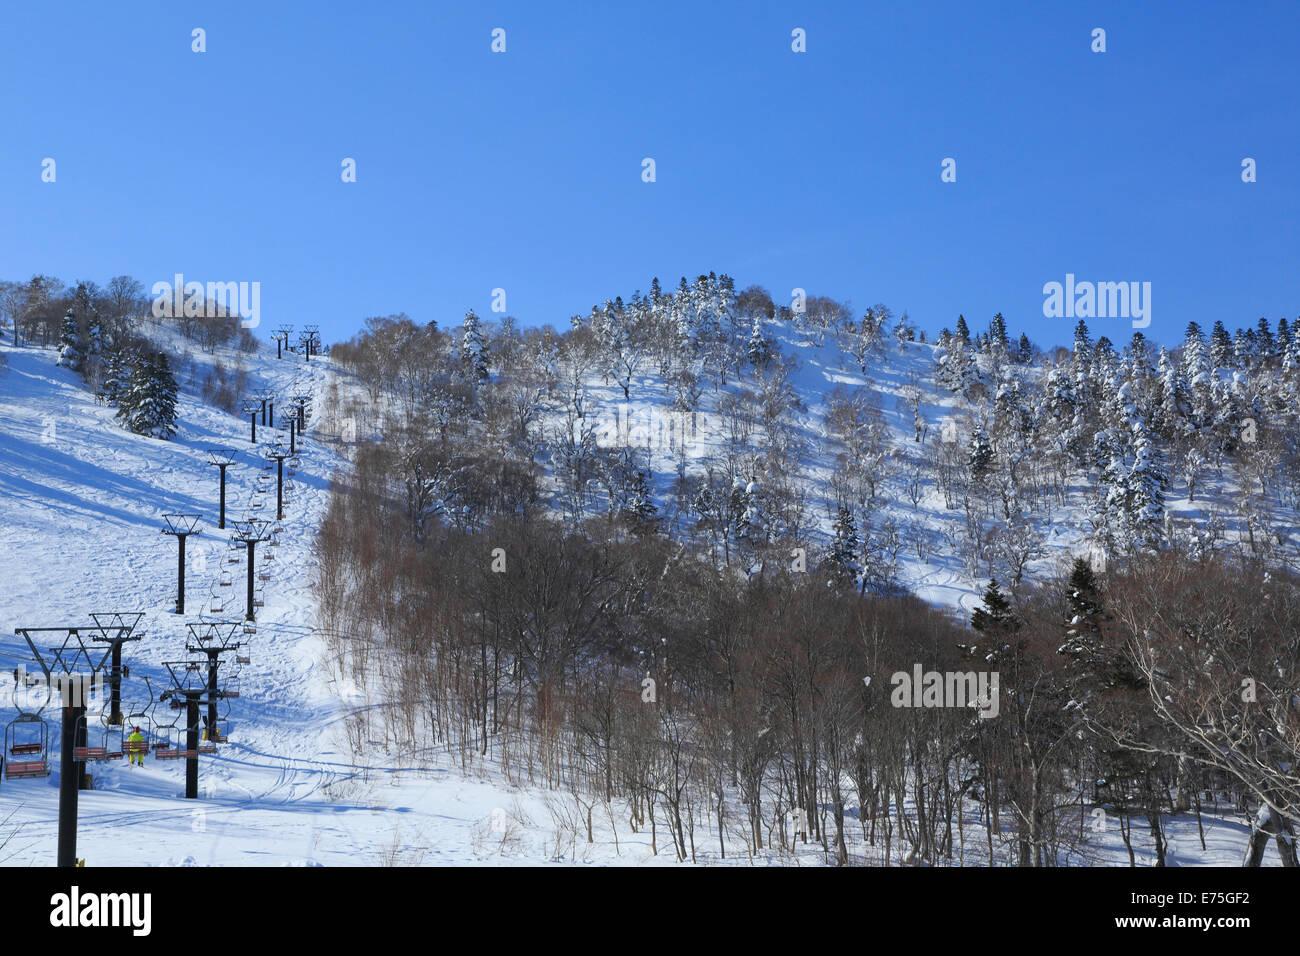 japan ski powder stock photos & japan ski powder stock images - alamy